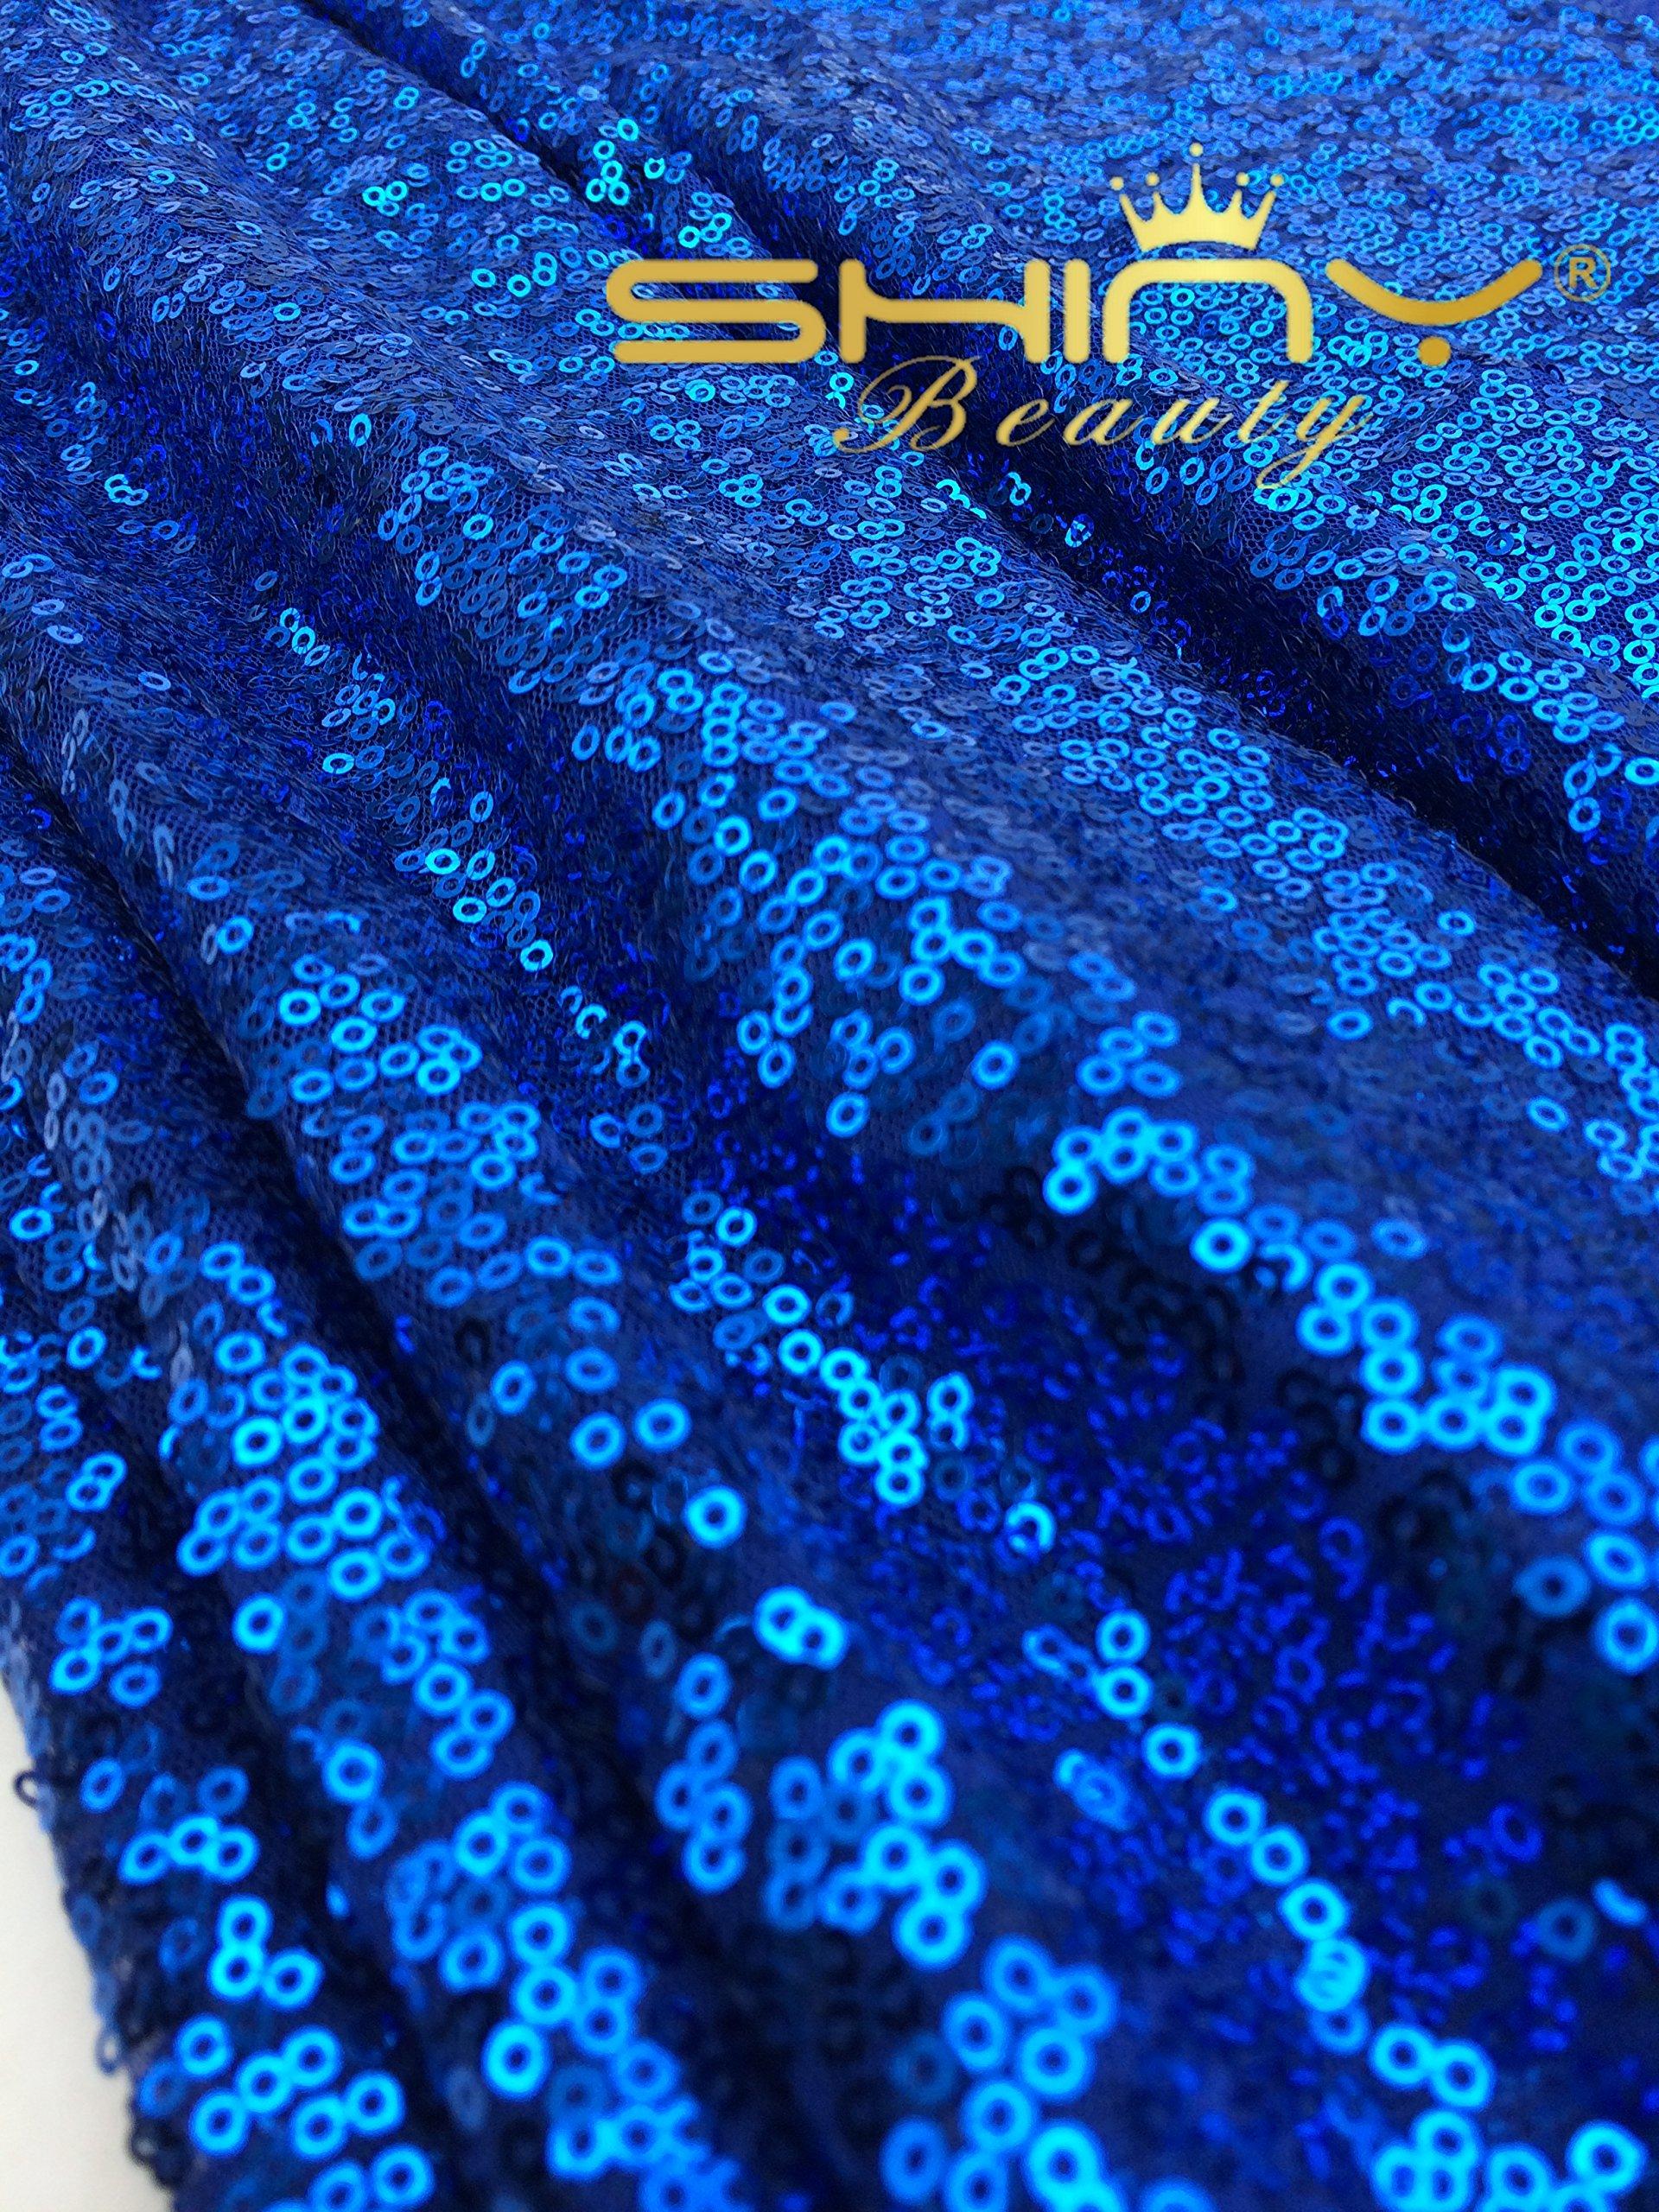 ShinyBeauty 45 Feet 15 Yards Royal Blue Sequin Fabric for Custom Carpet/Tablecloth/Backdrop/Cloth (Royal Blue) by ShinyBeauty